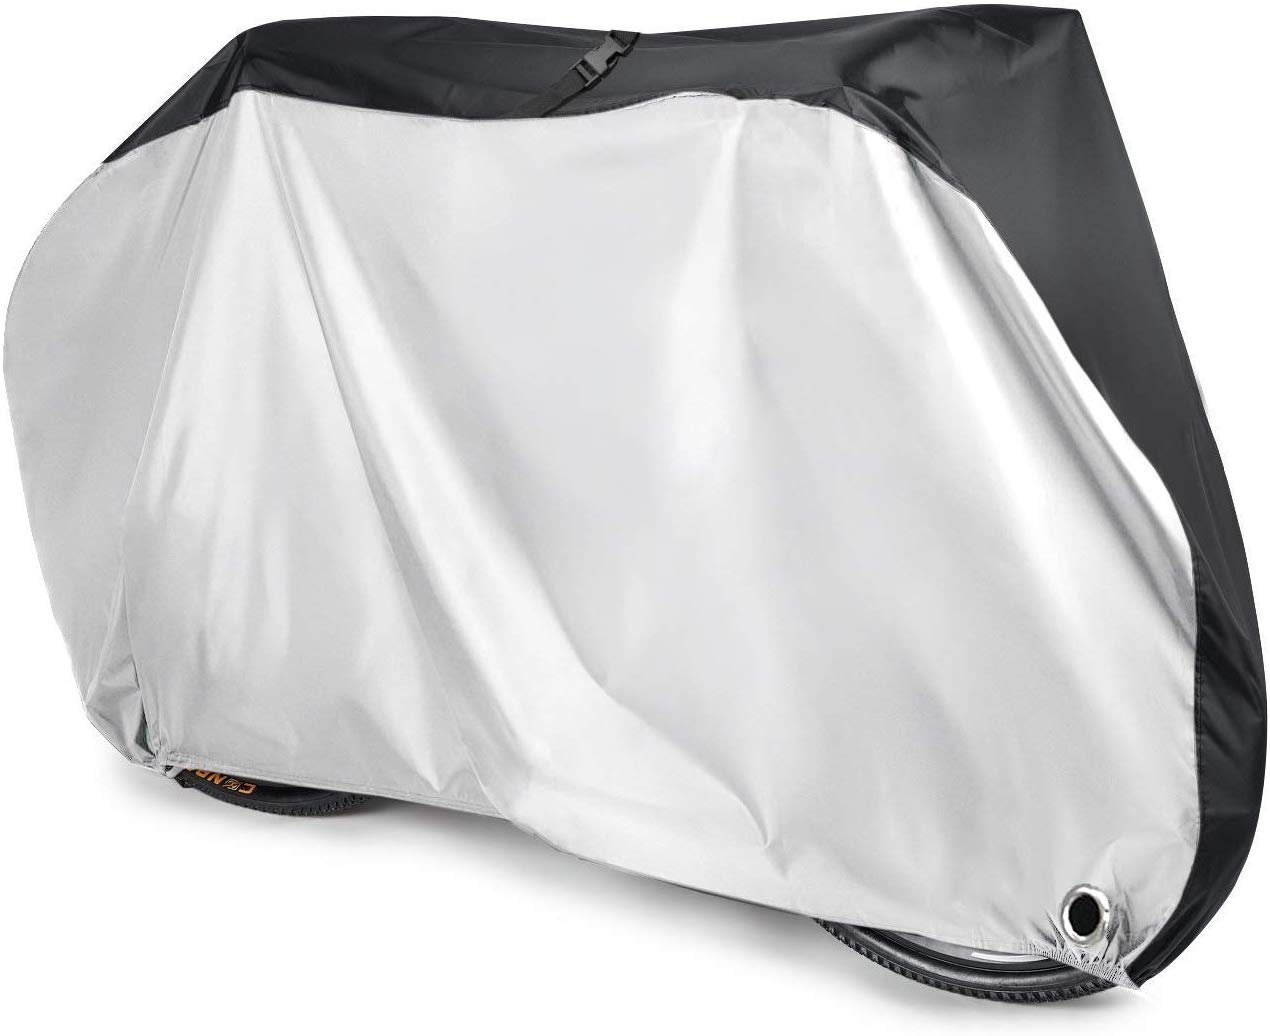 Funda plegable universal para bicicleta Nobran impermeable, multifunci/ón, resistente al polvo, resistente a la lluvia